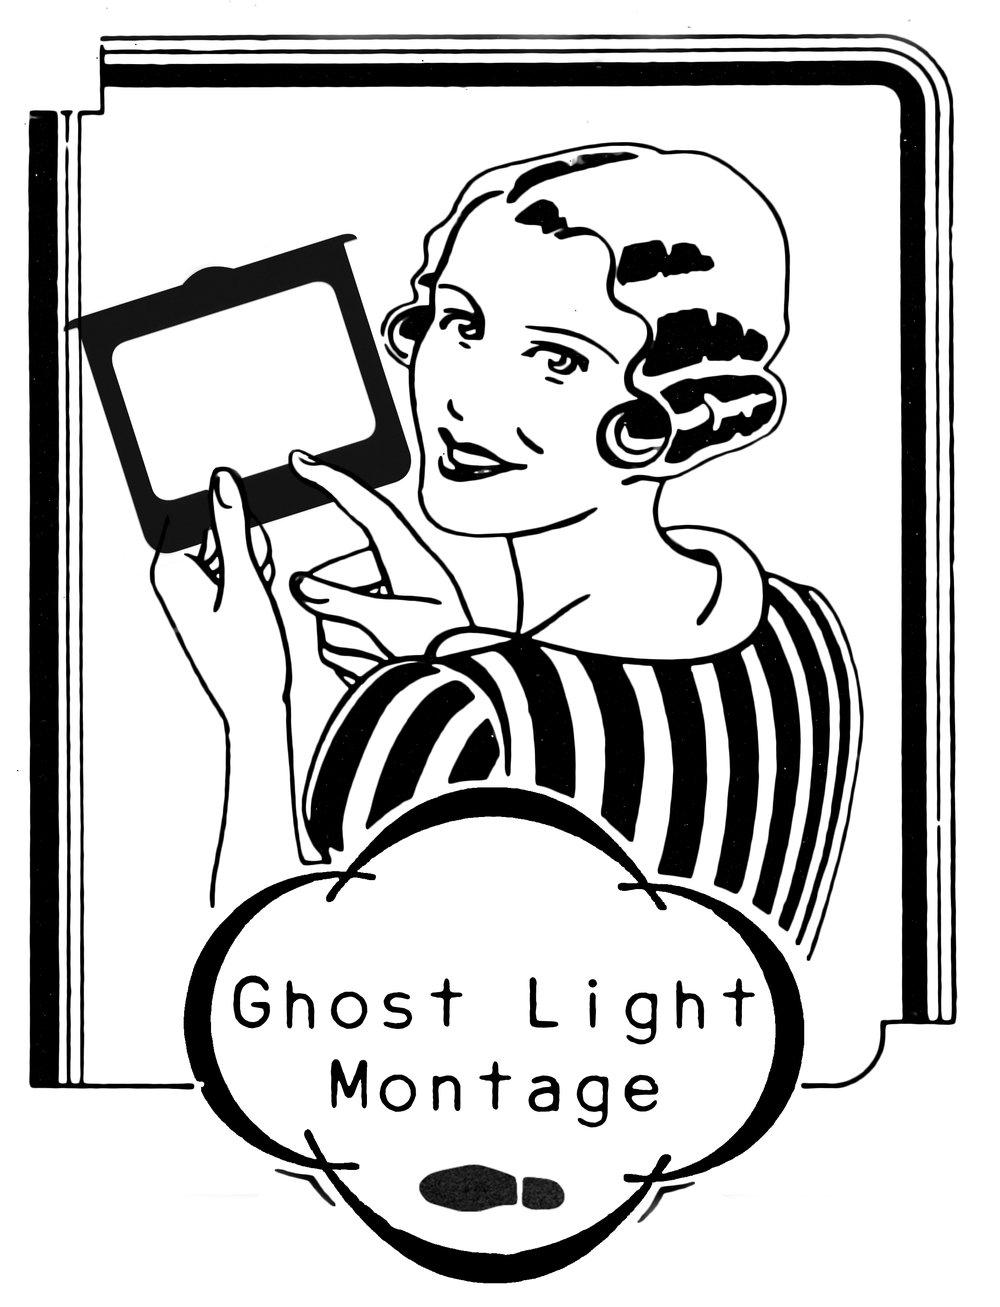 montage stamp.jpg